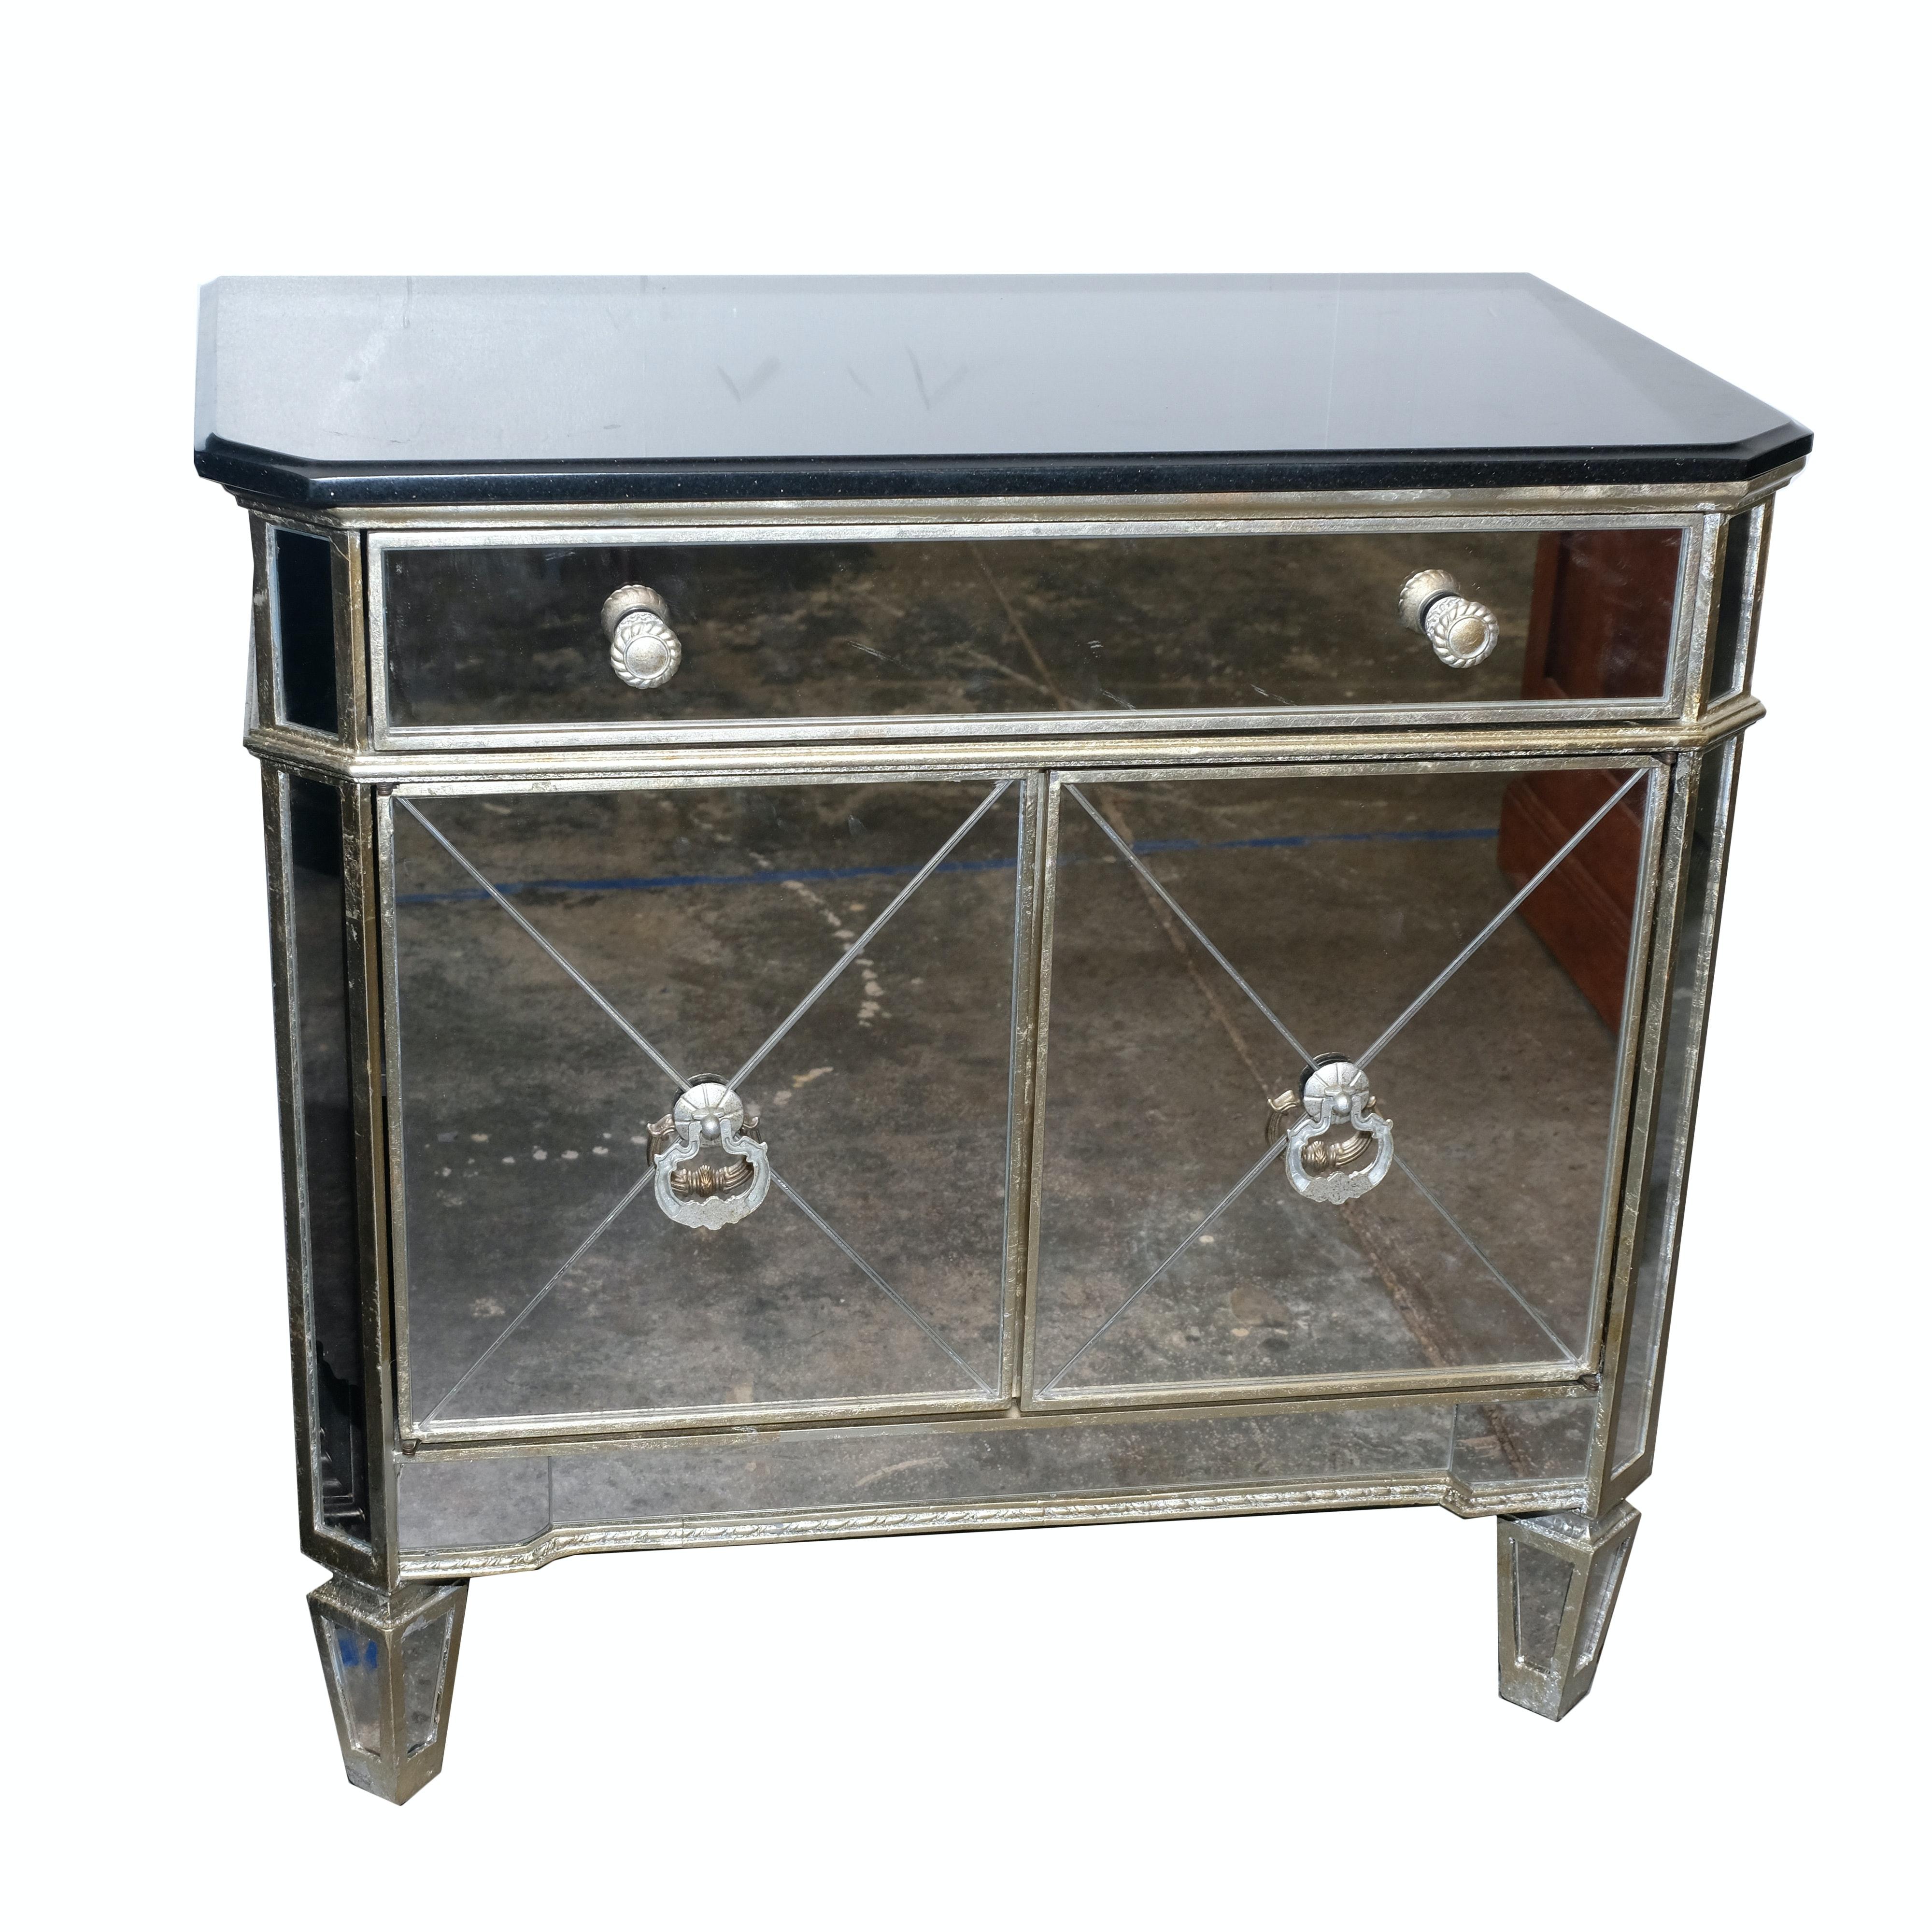 Zhong Shun Wood Art Company Mirrored Nightstand With Stone Top